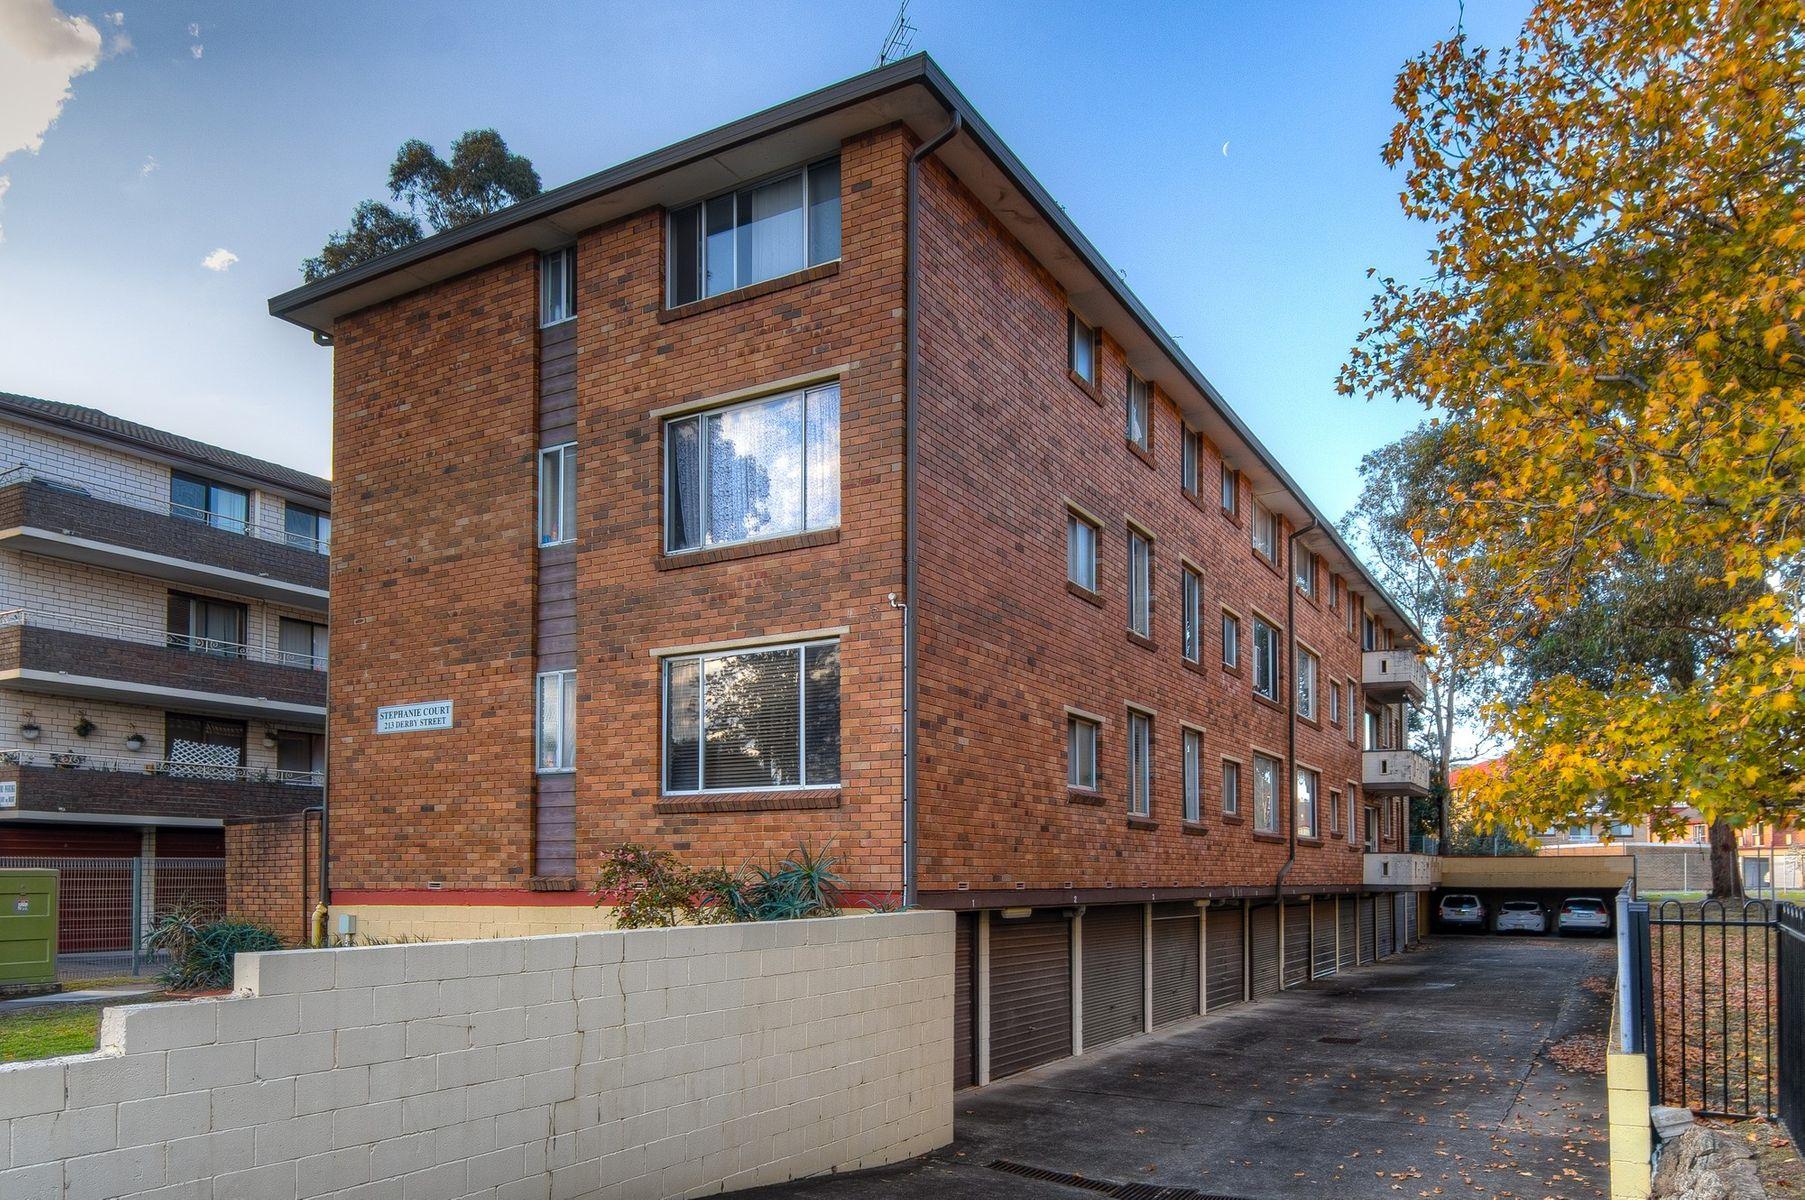 14/213 Derby Street, Penrith, NSW 2750